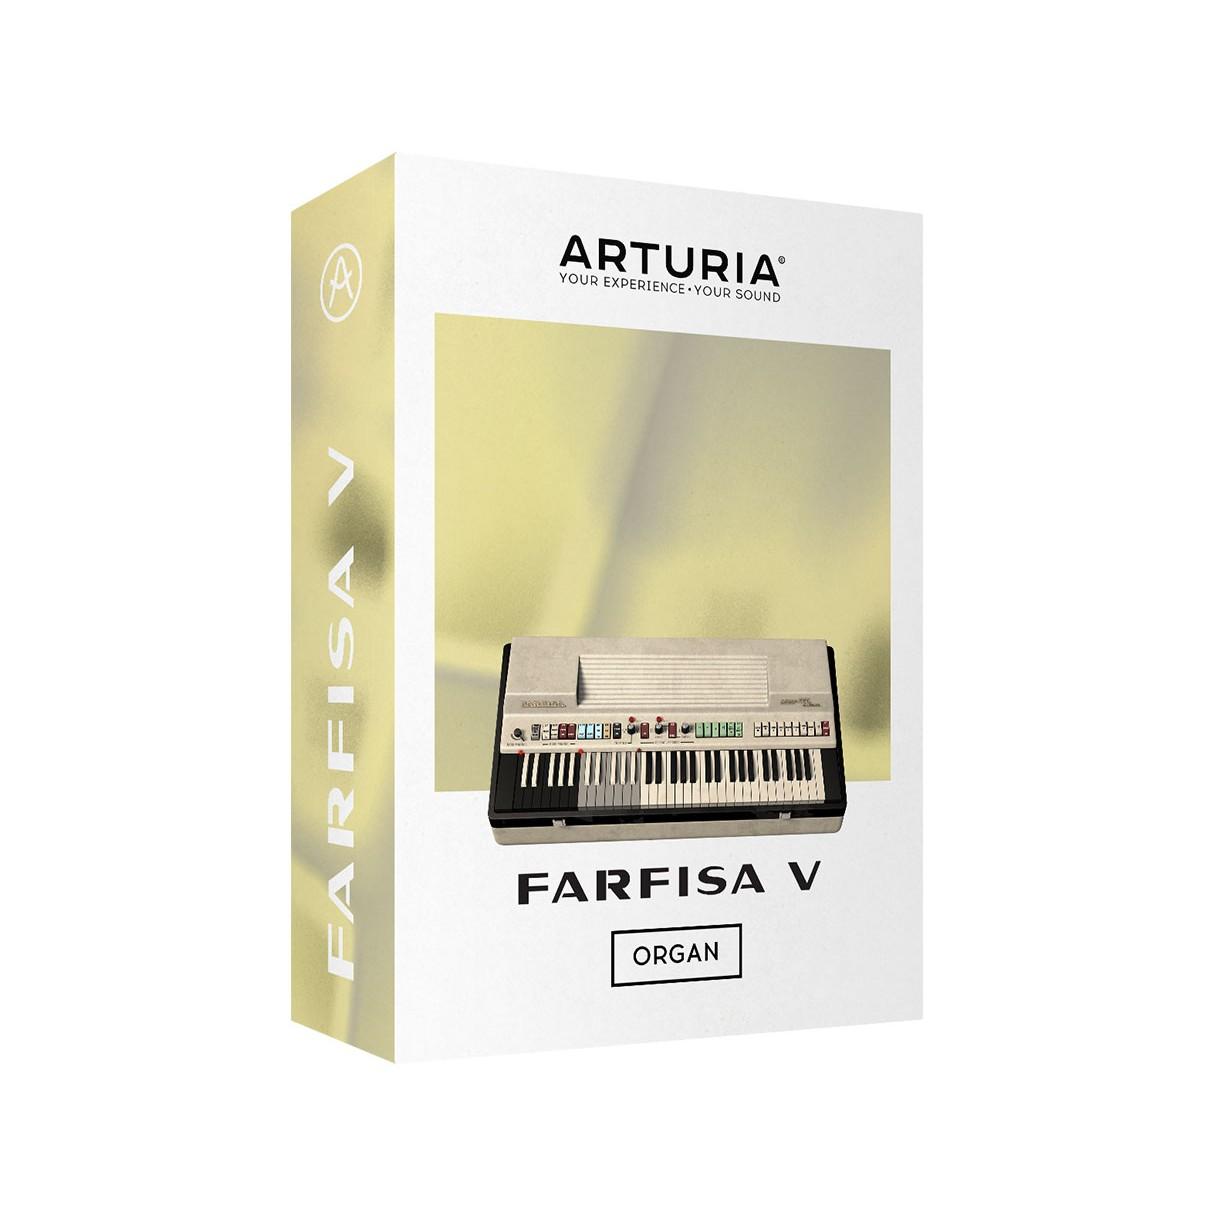 Arturia Farfisa V Software Organ License (Instant Software